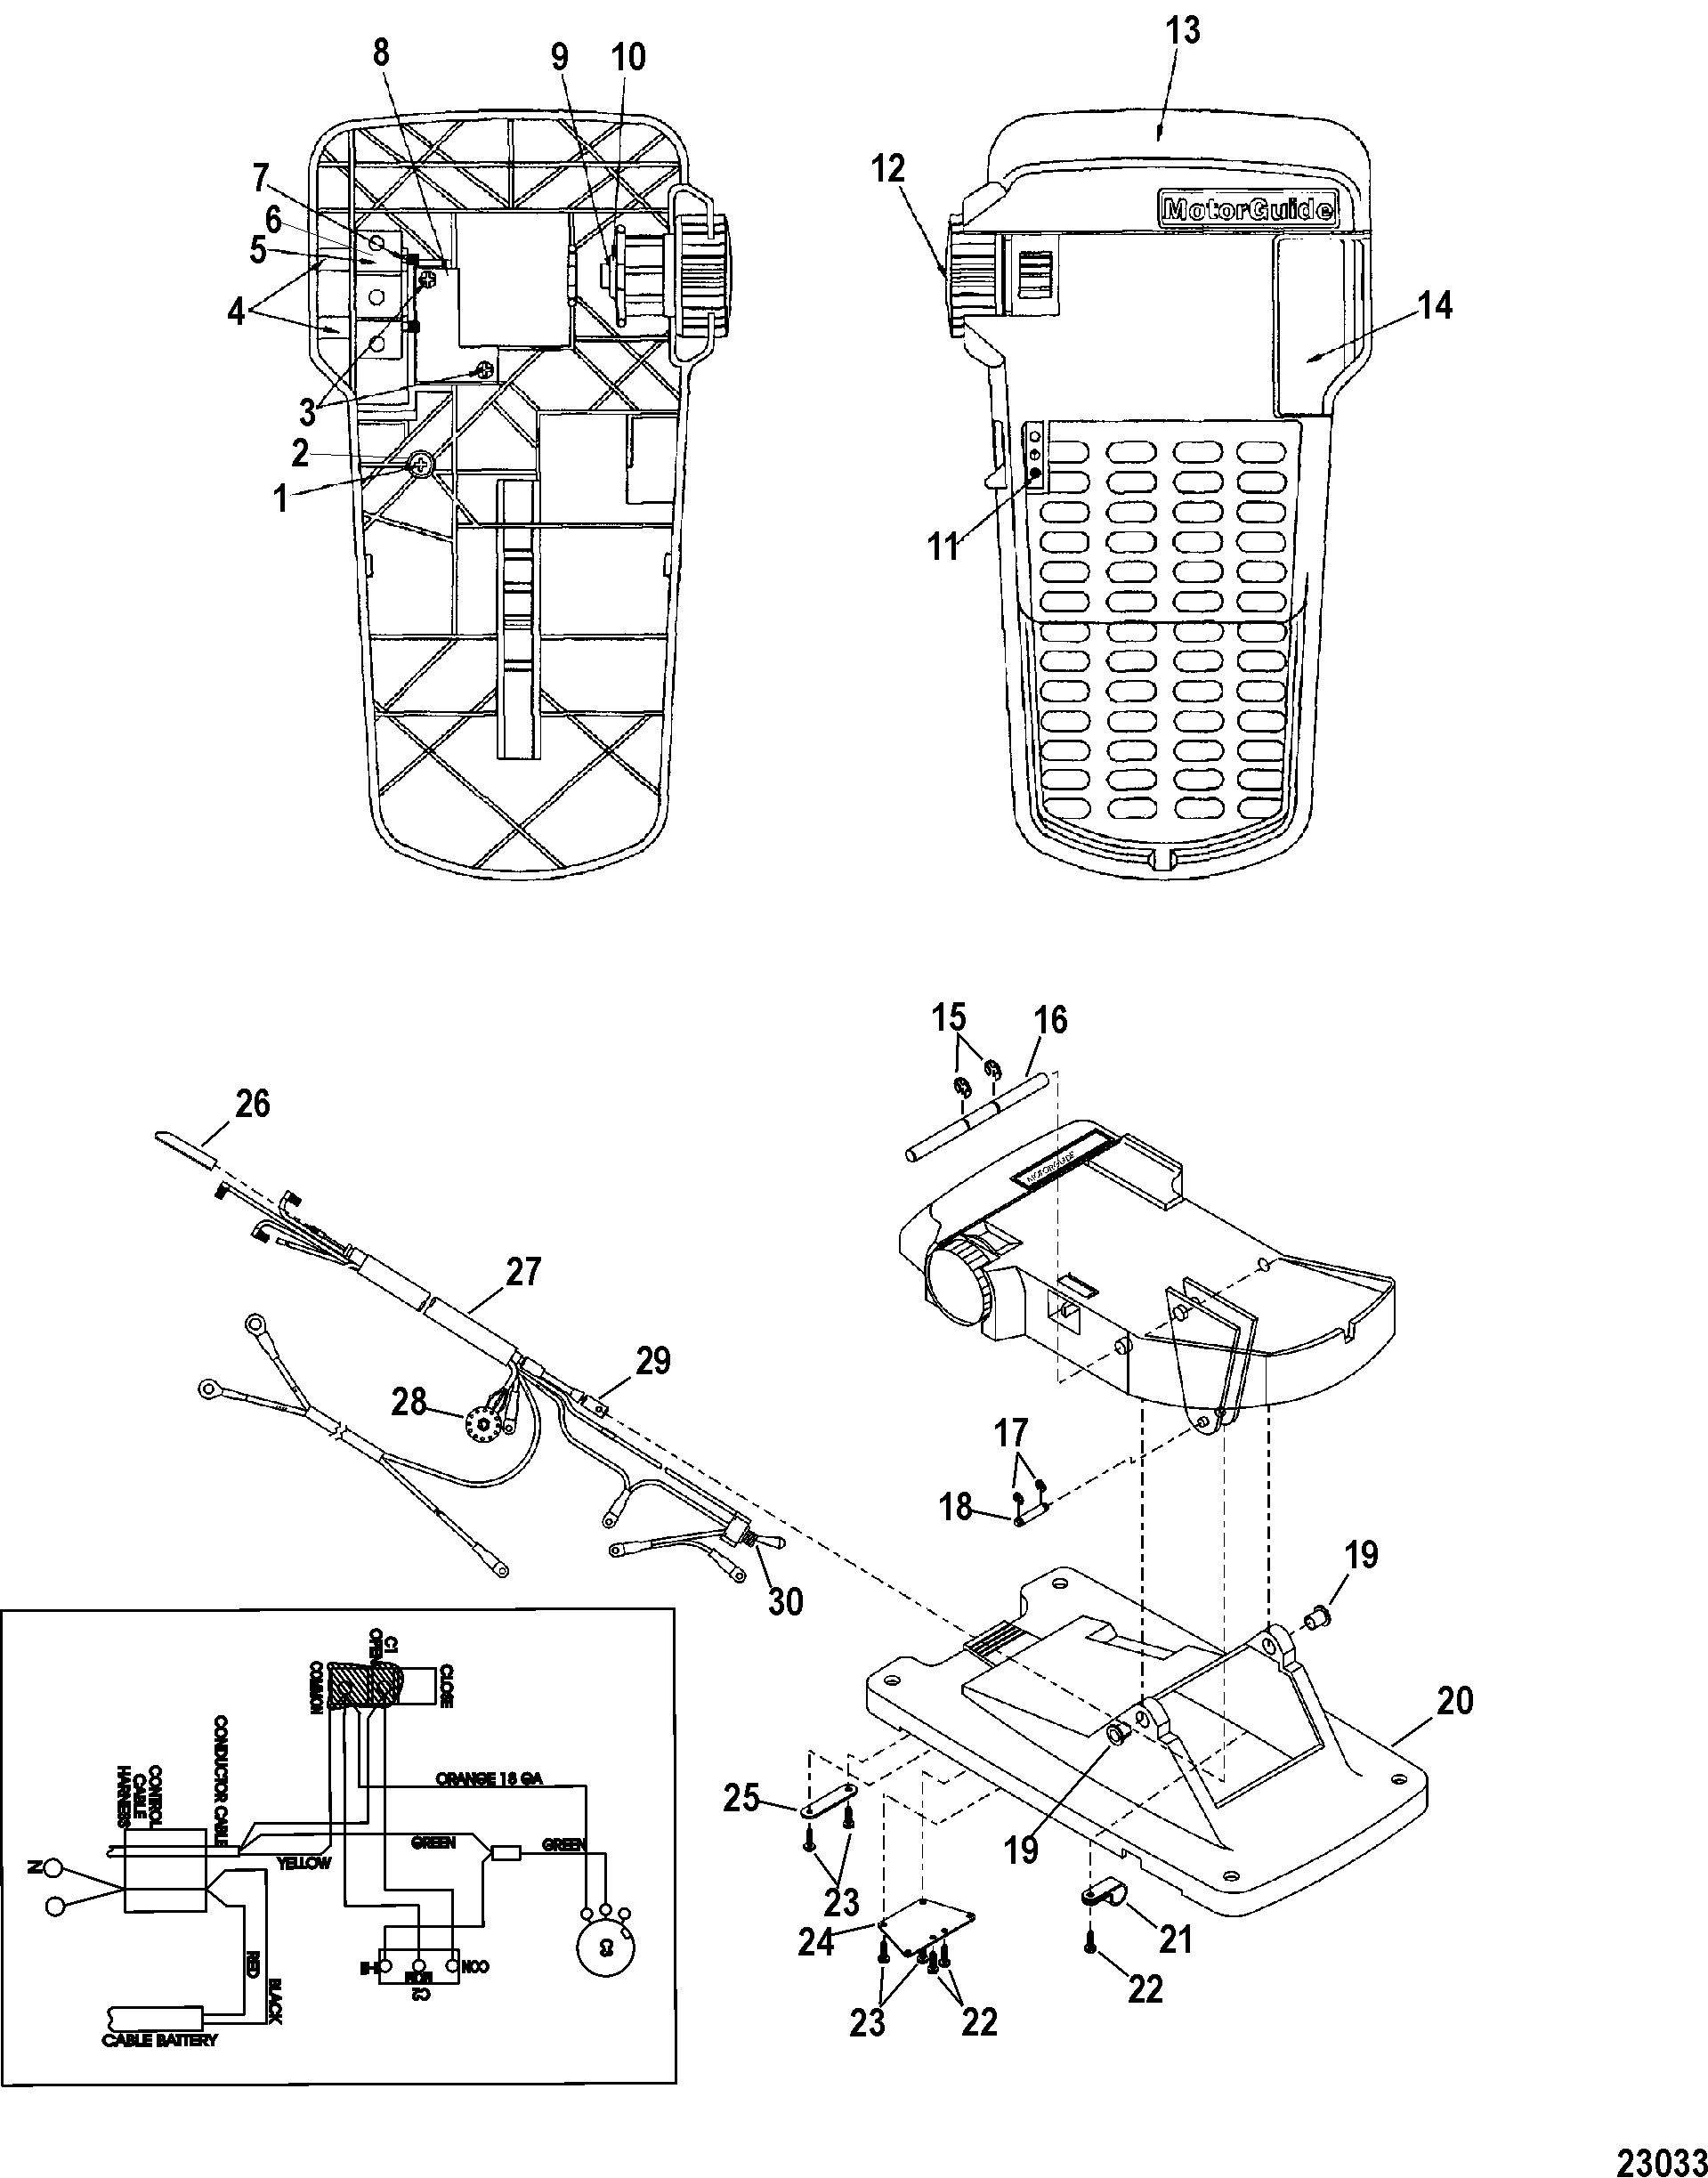 ������� ��������� trolling motor motorguide brute series 9b000001 24V Trolling Motor Wiring Diagram foot pedal assembly(m899723t)